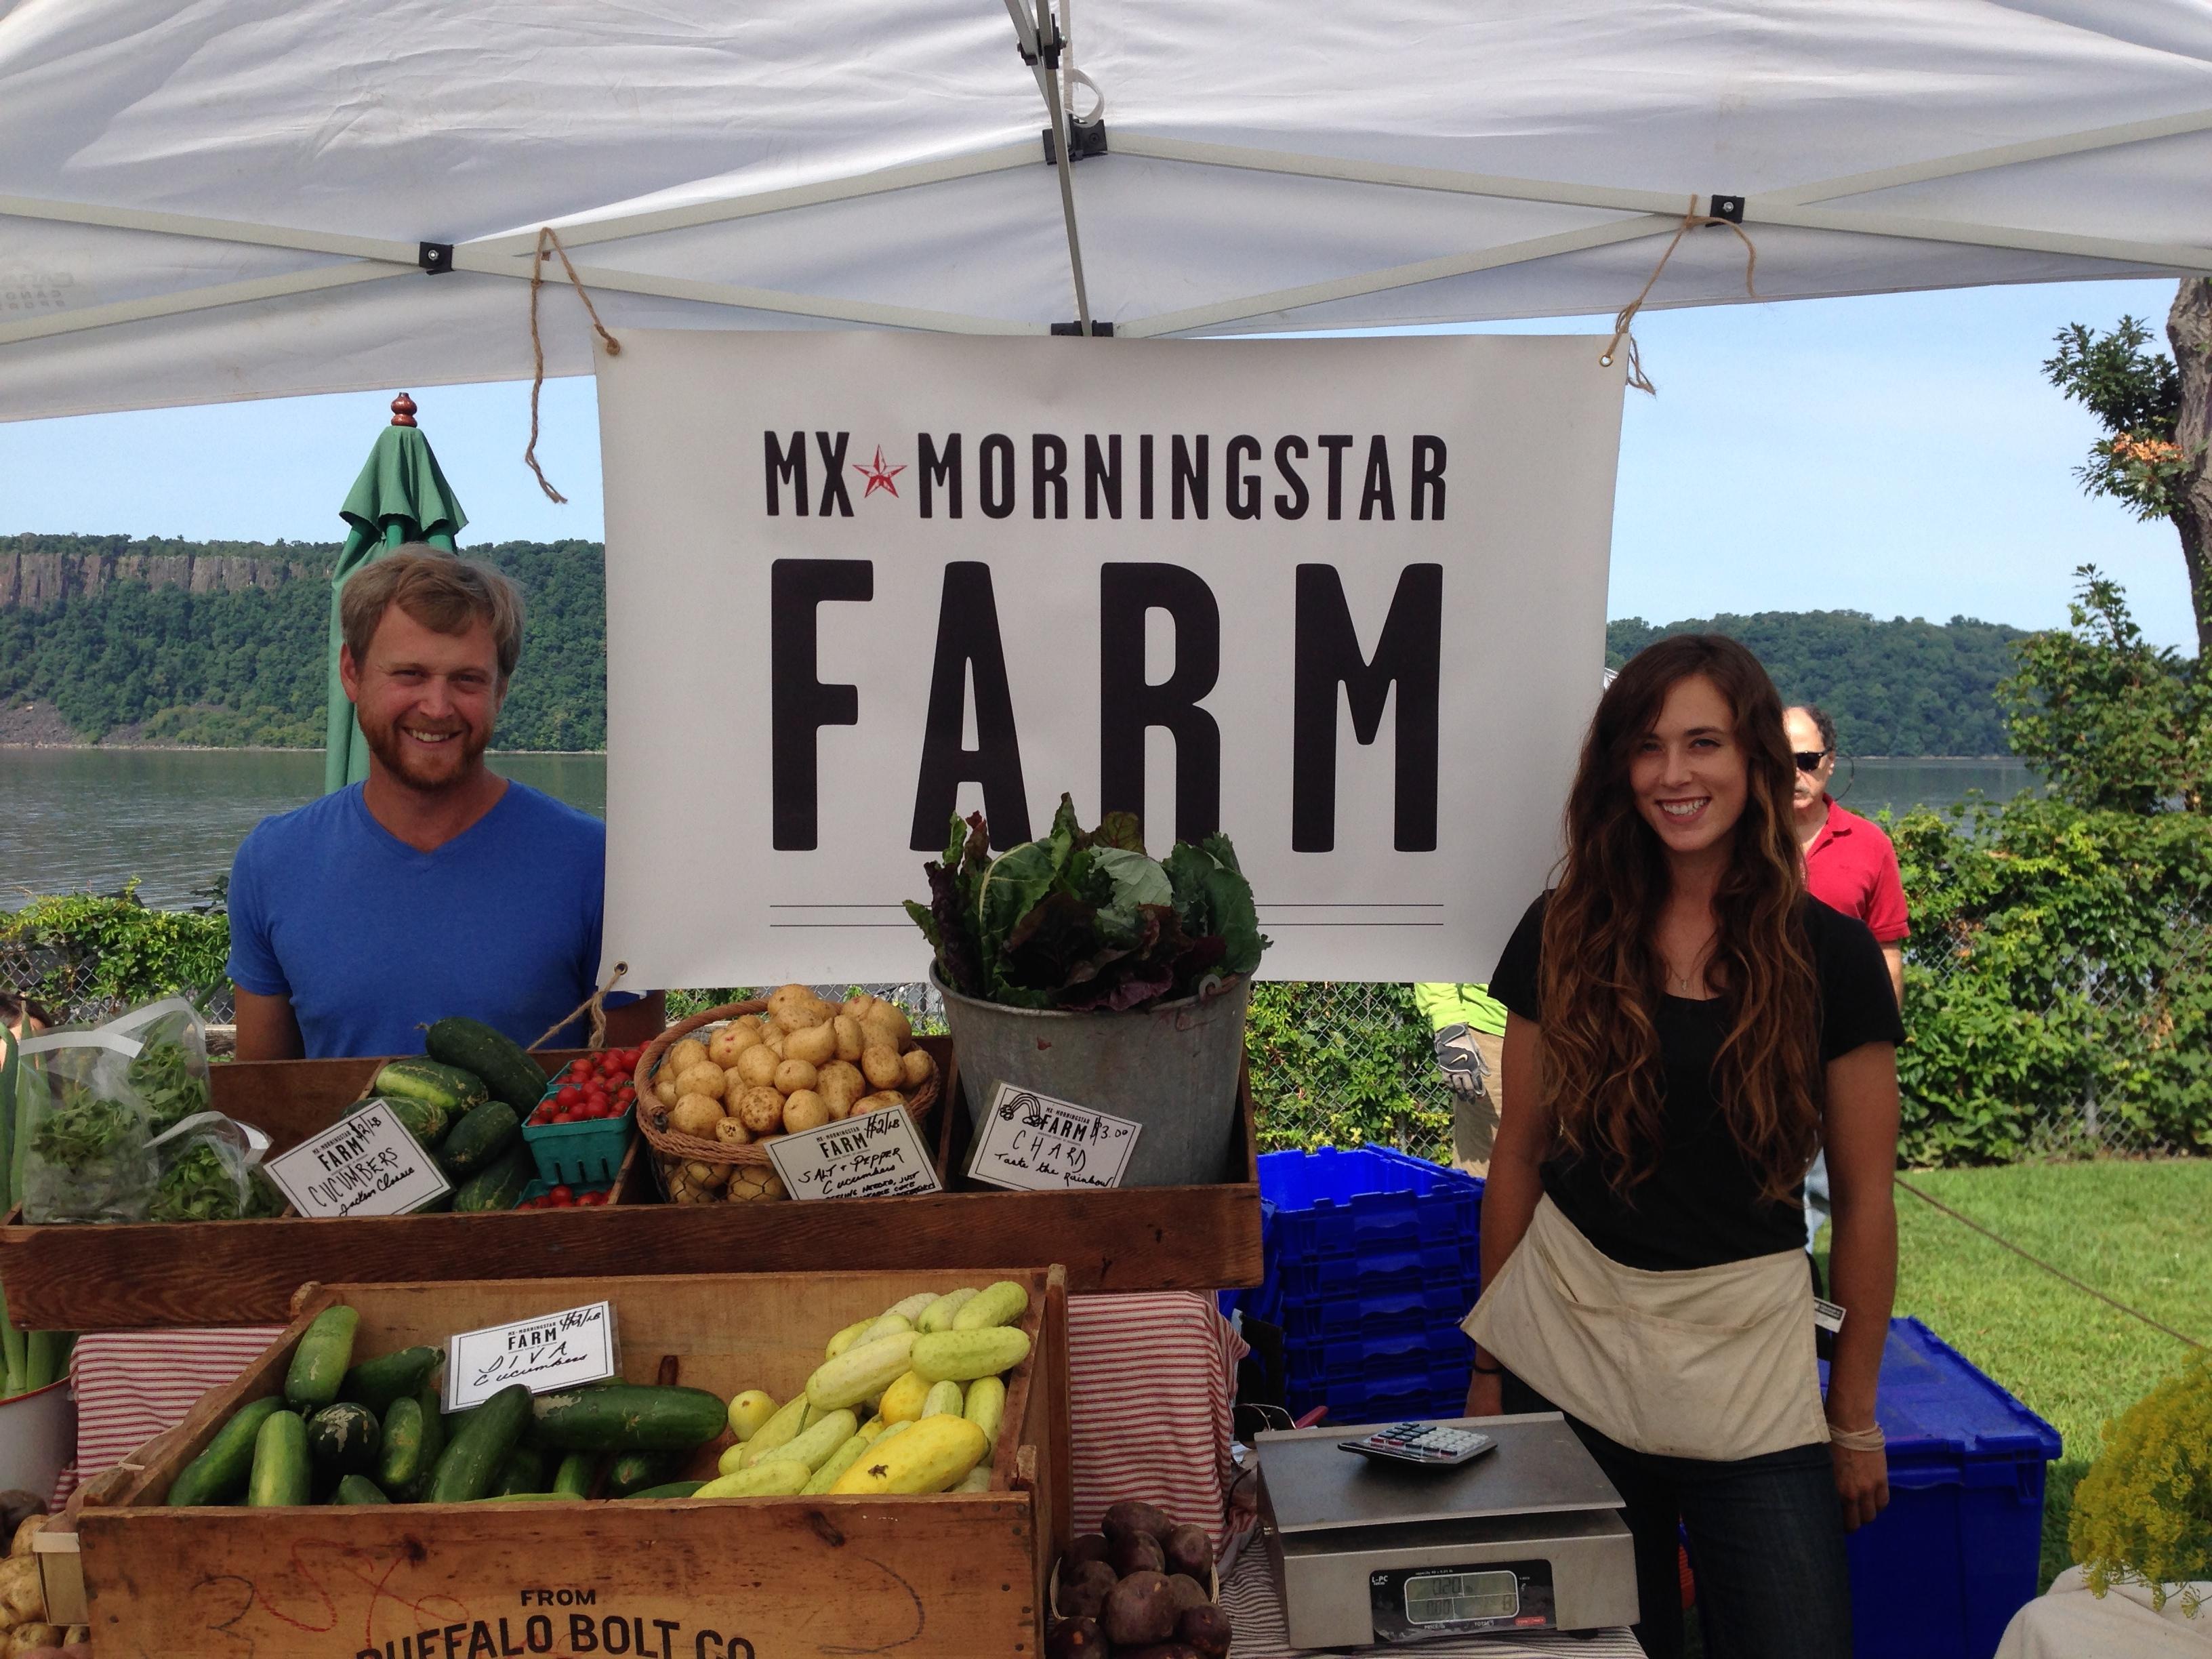 Buffalo Bolt Company Boxes And Veggies At Mx Morningstar Farm Stand Jim Nolan S Blog